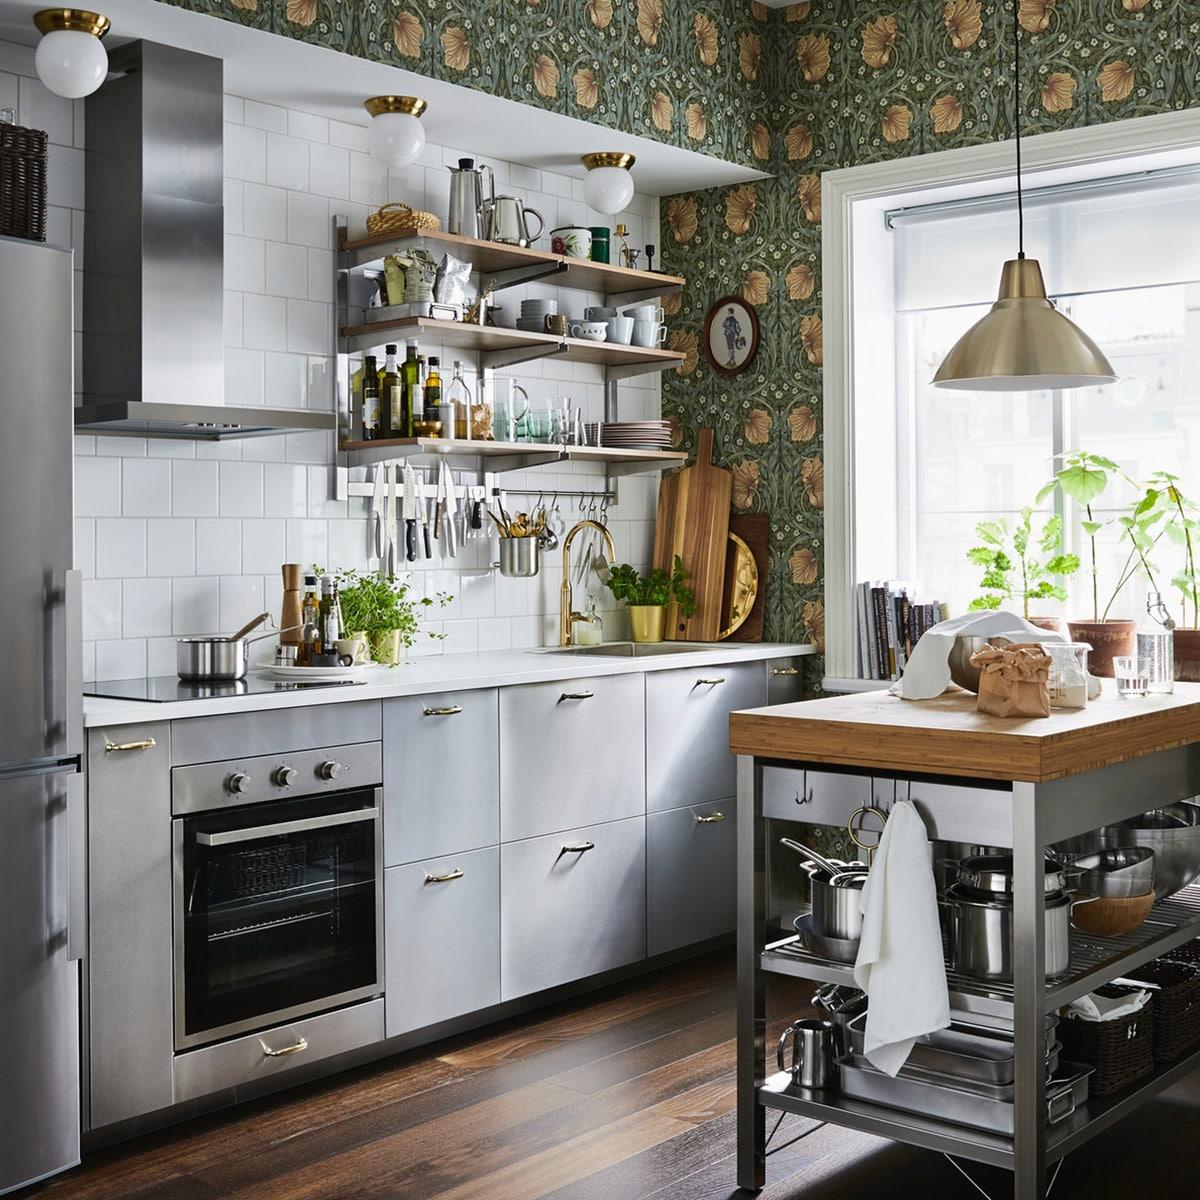 Idee per arredare la cucina - IKEA